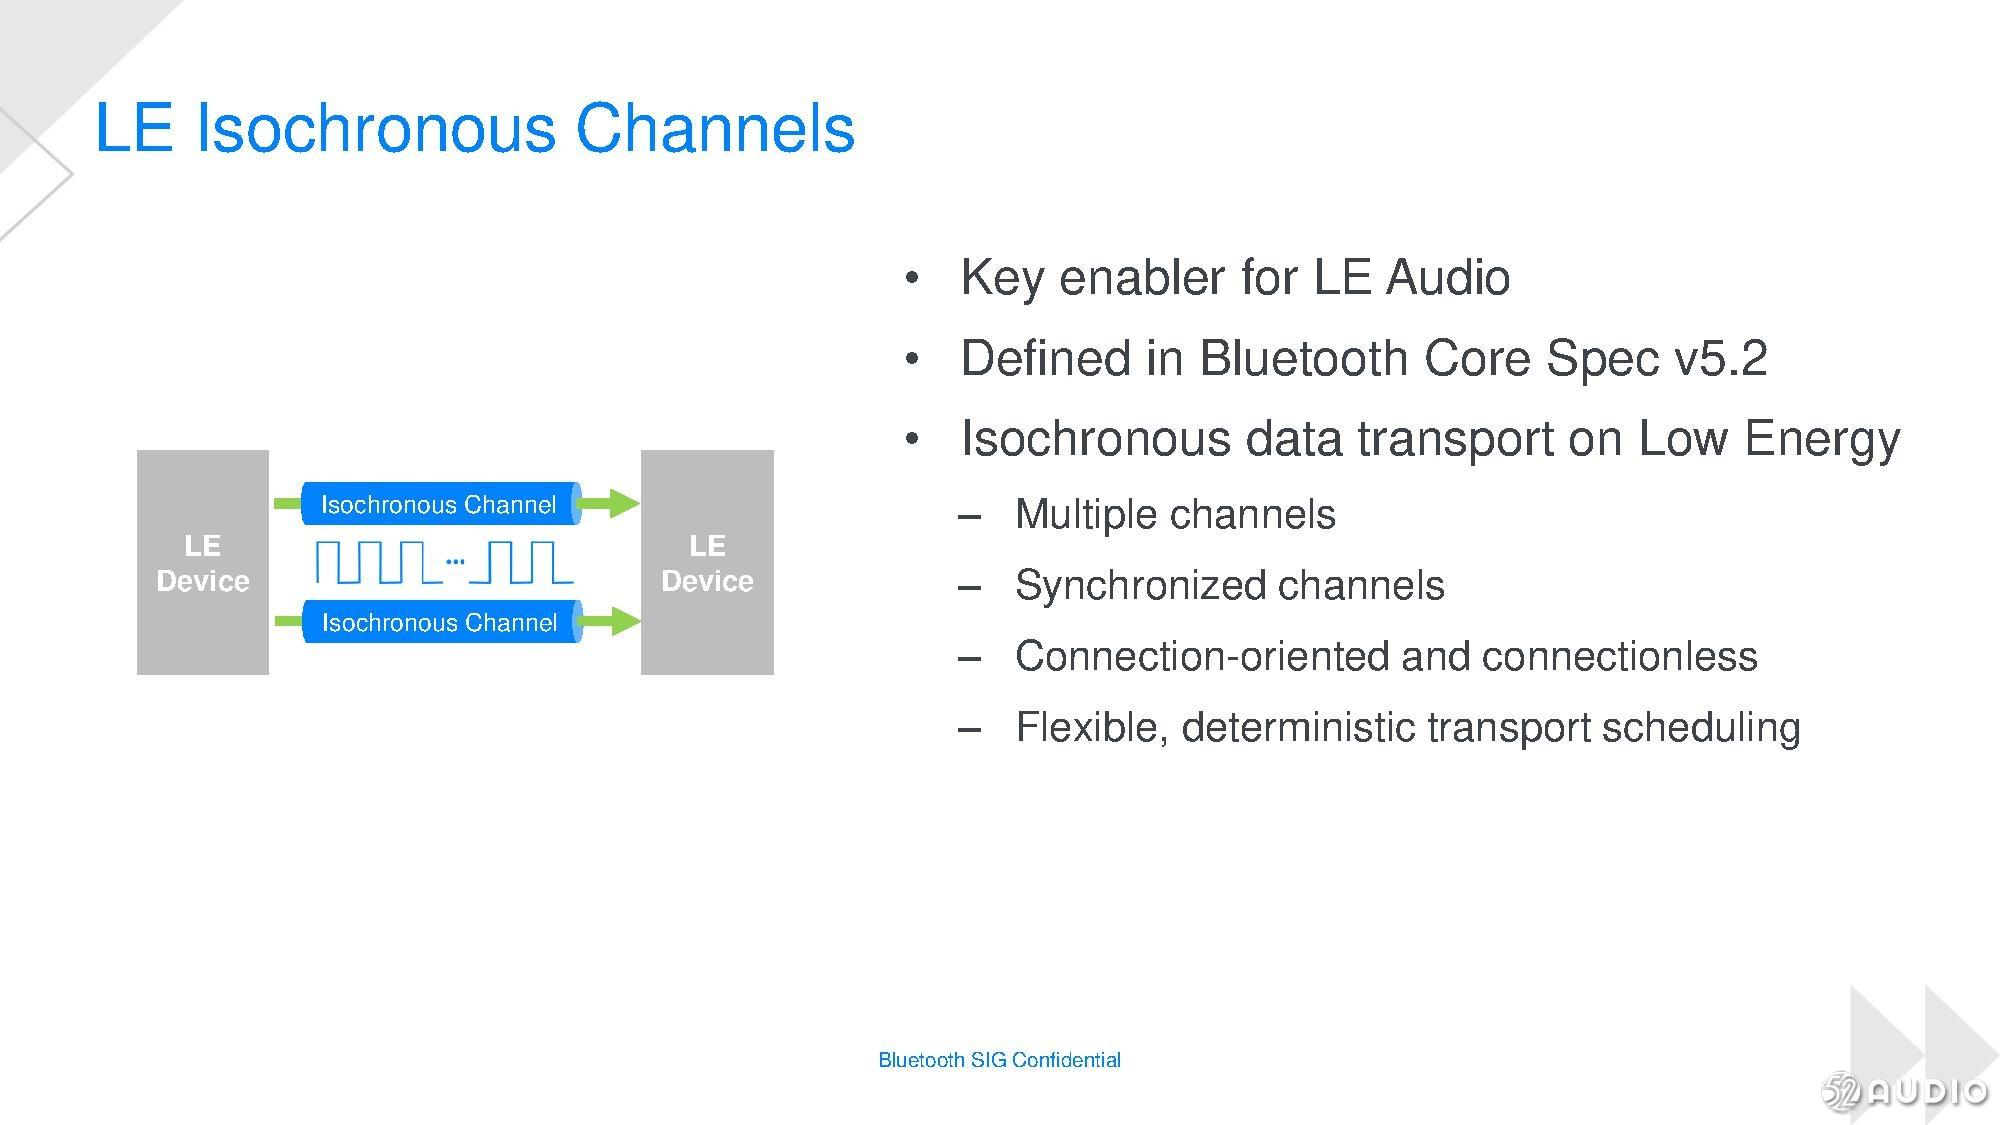 CES2020 TWS耳机新品发展趋势:主动降噪、健康辅助、个人化定制、3D立体声效-我爱音频网